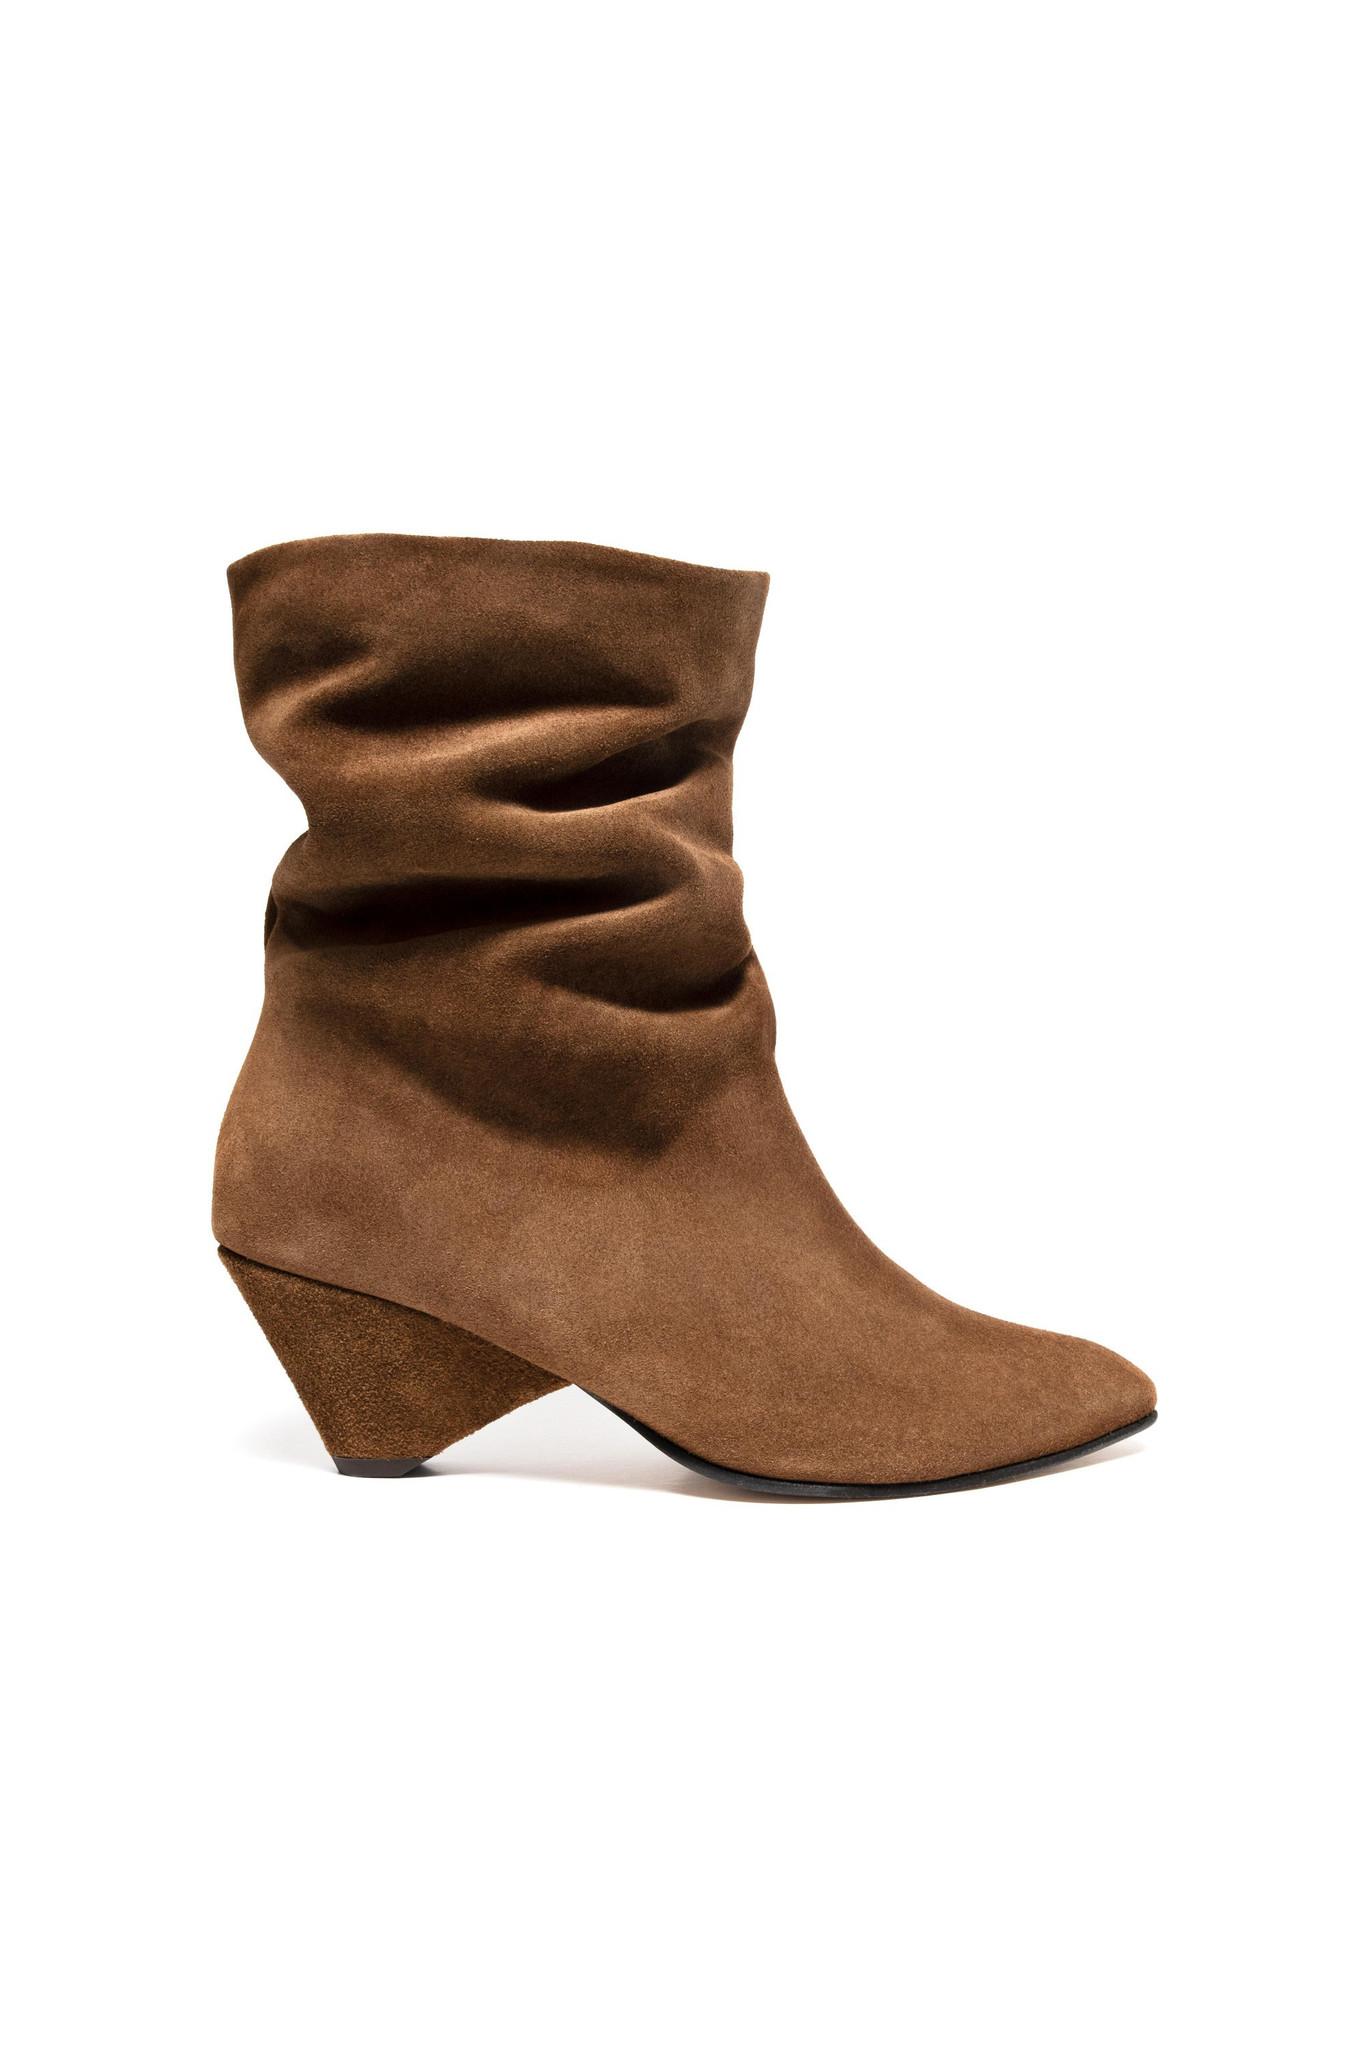 Vully 50 Triangle Calf Suede Boot - Cinnamon-1